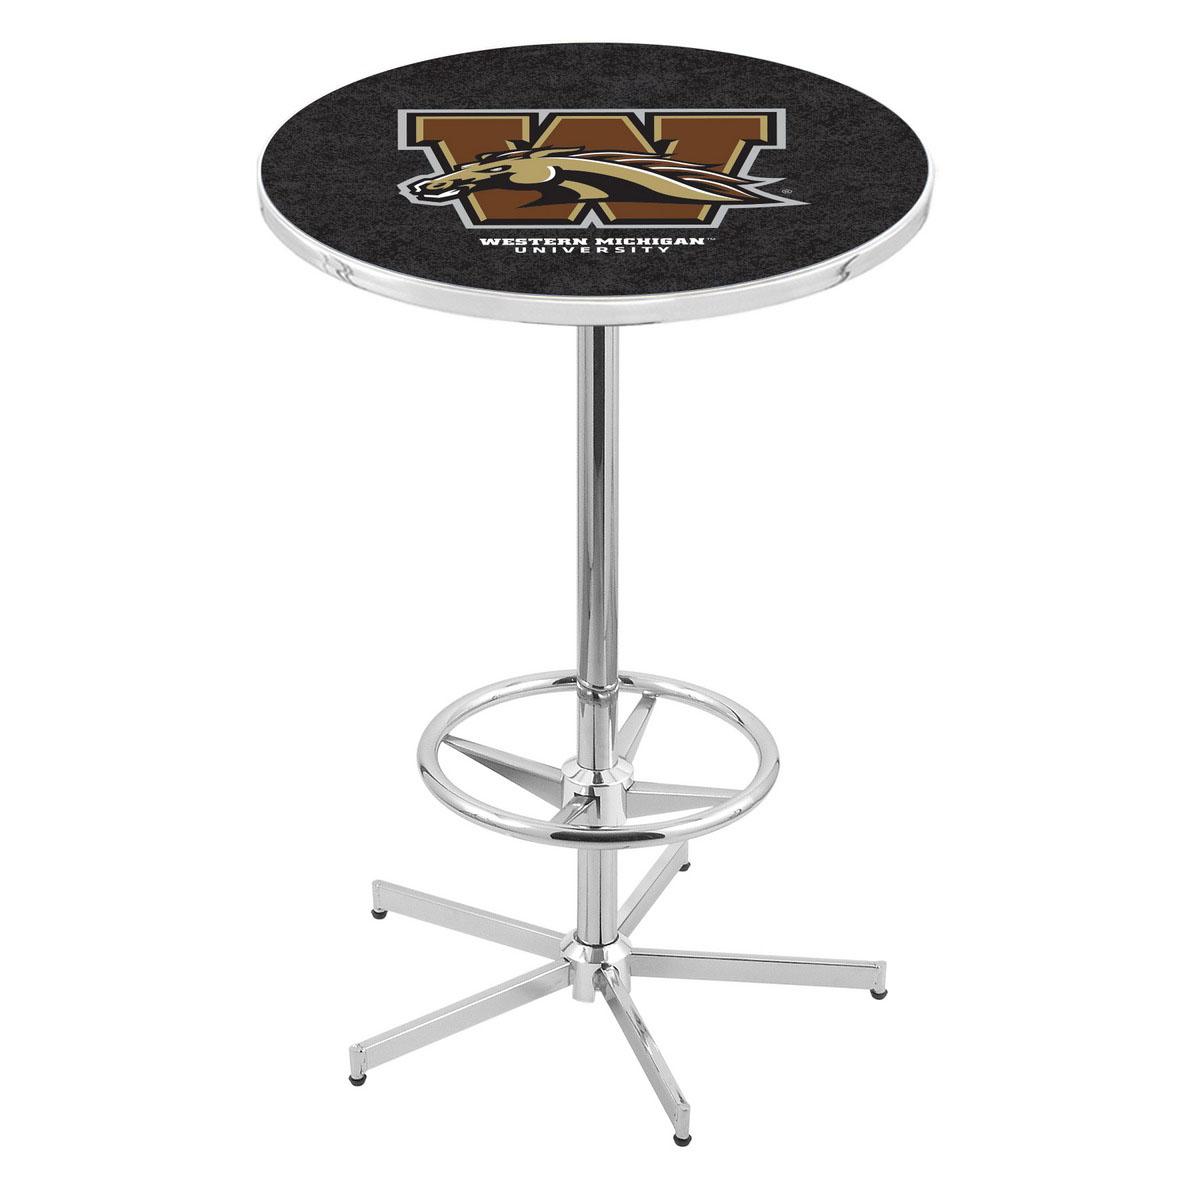 Superb-quality Chrome Western Michigan Pub Table Product Photo